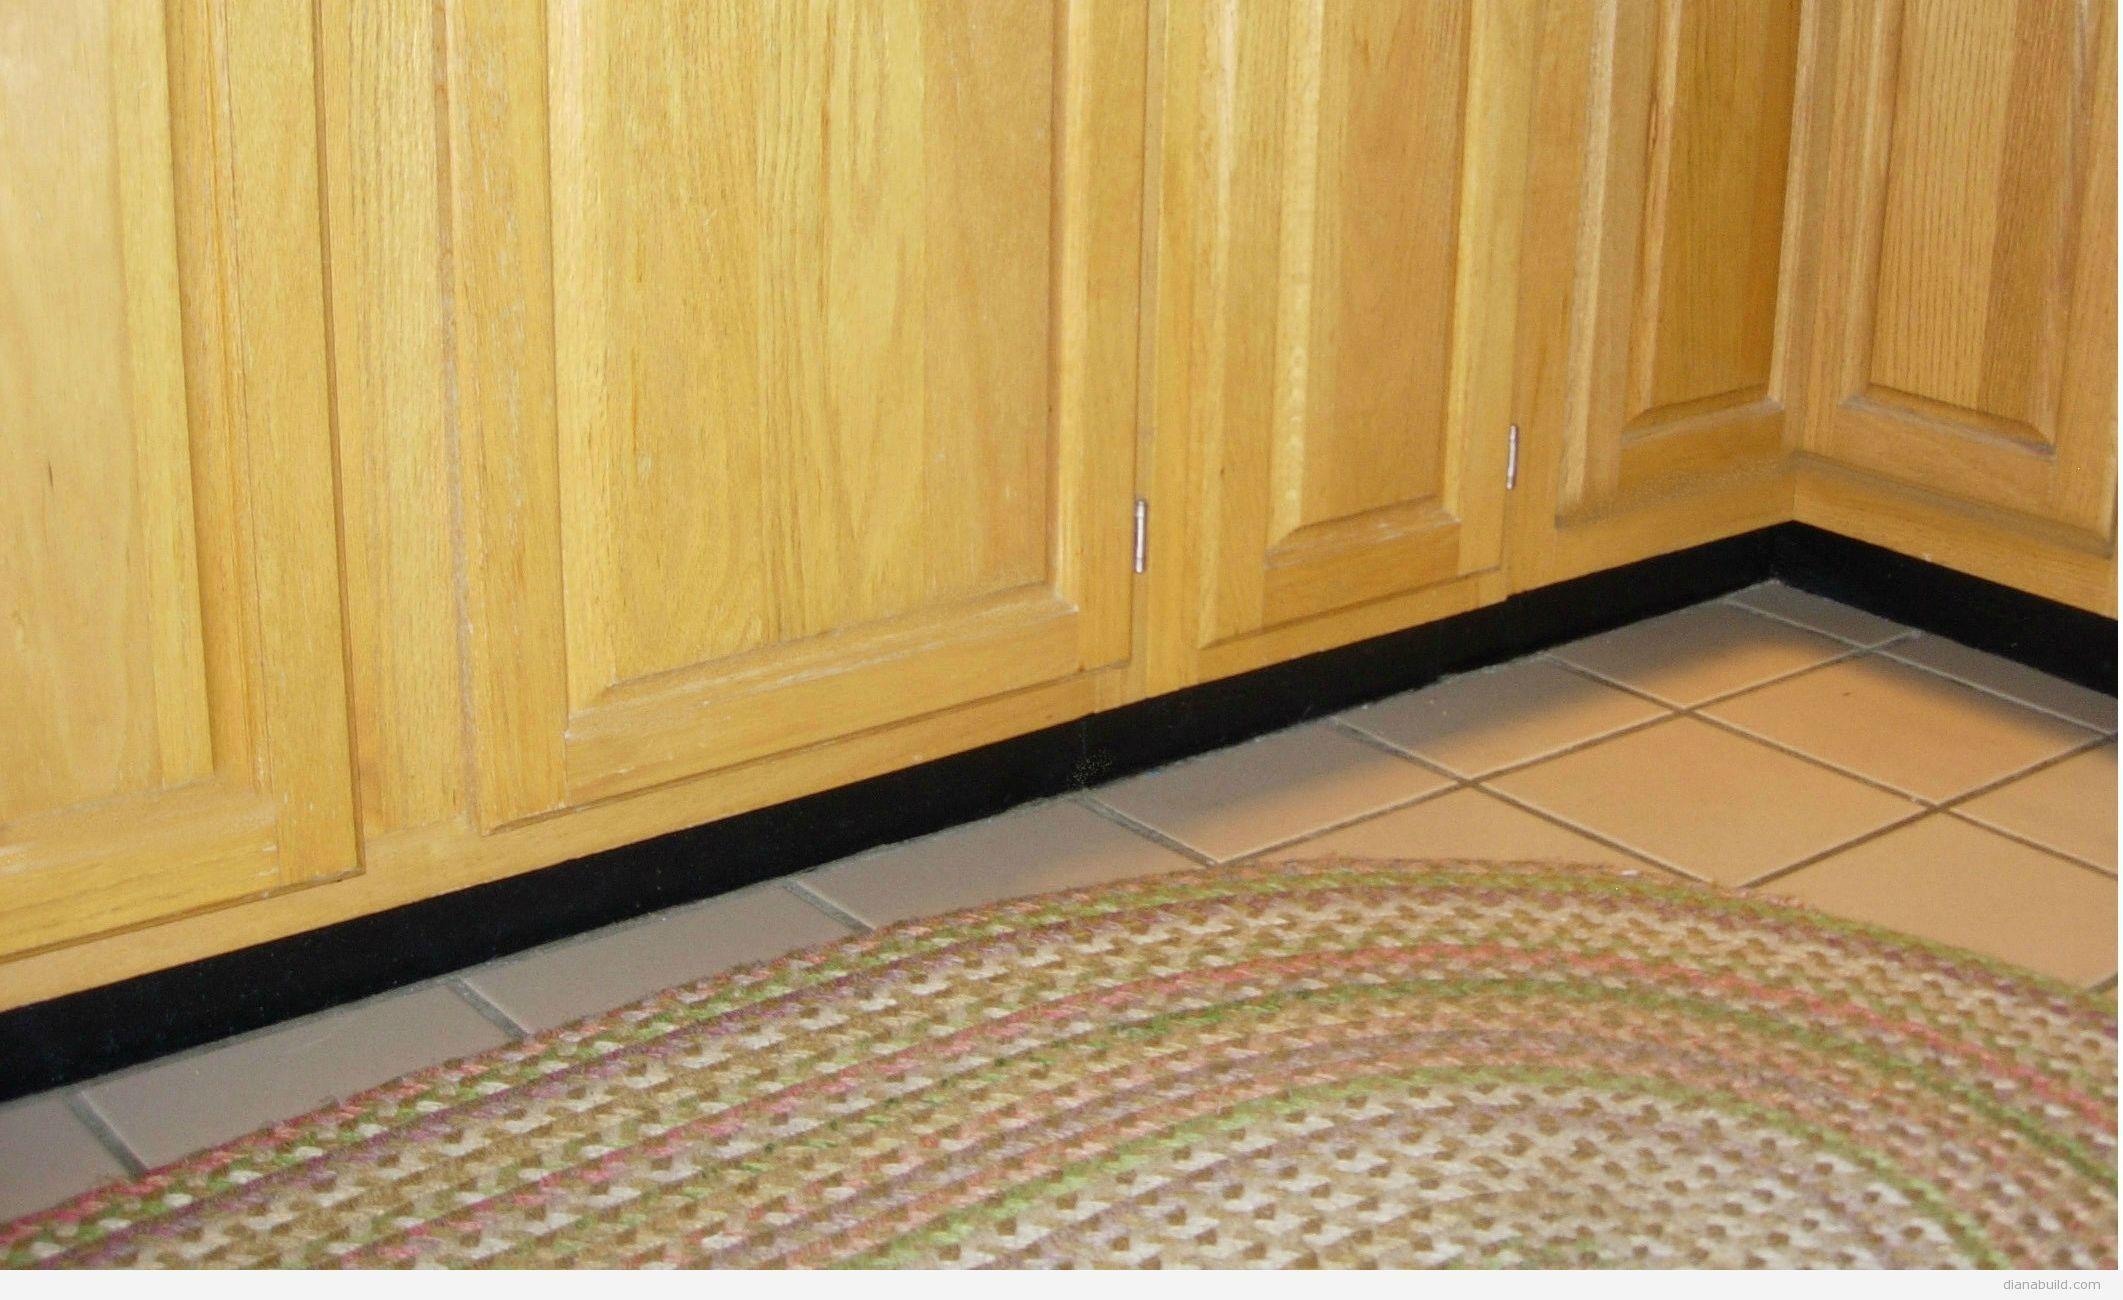 Kitchen Cabinet Toe Kick Plate Kitchen Cabinets Toe Kick Cabinet Toe Kick Kick Plate